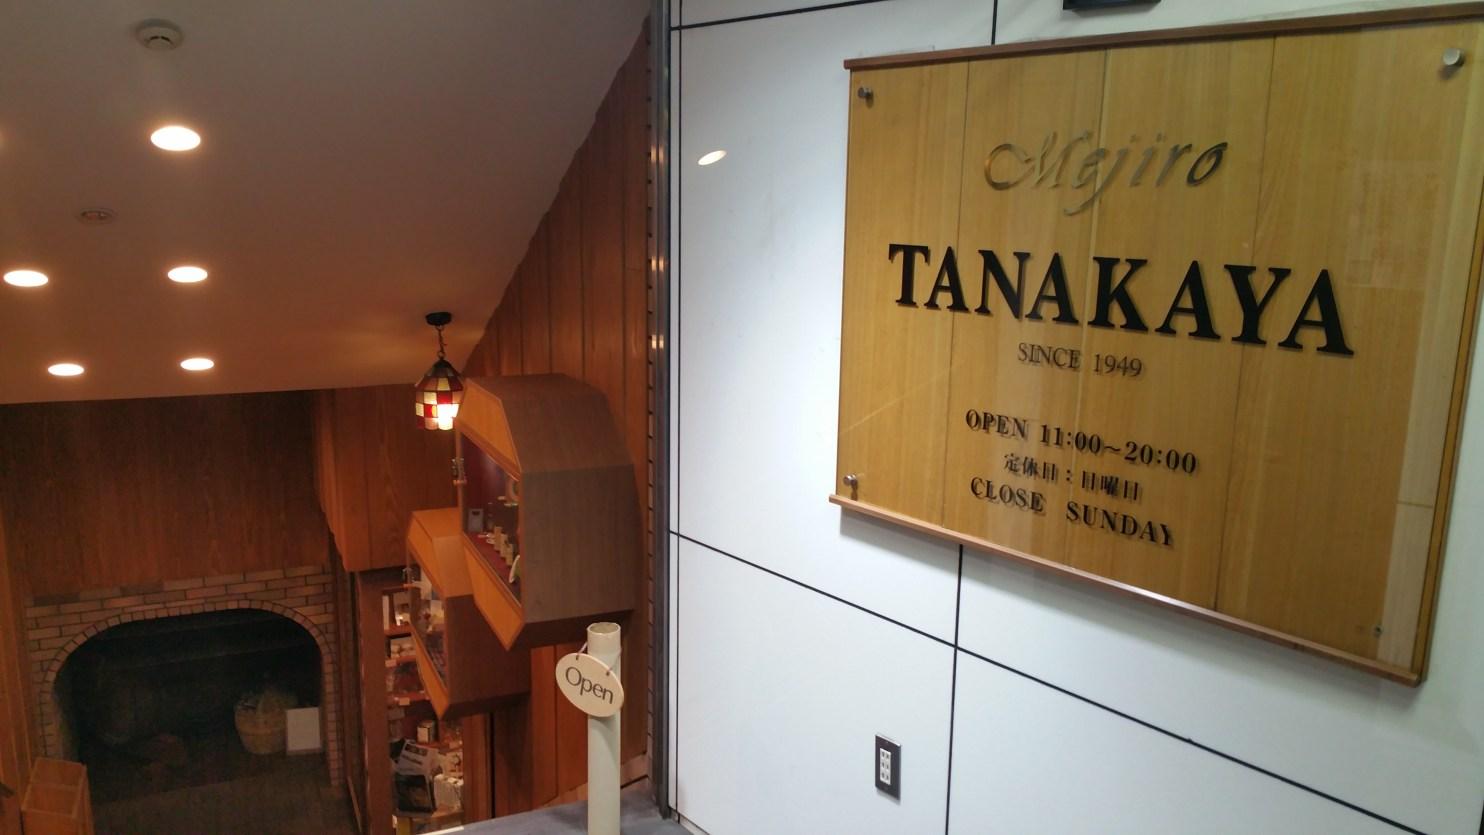 Tanakaya Front